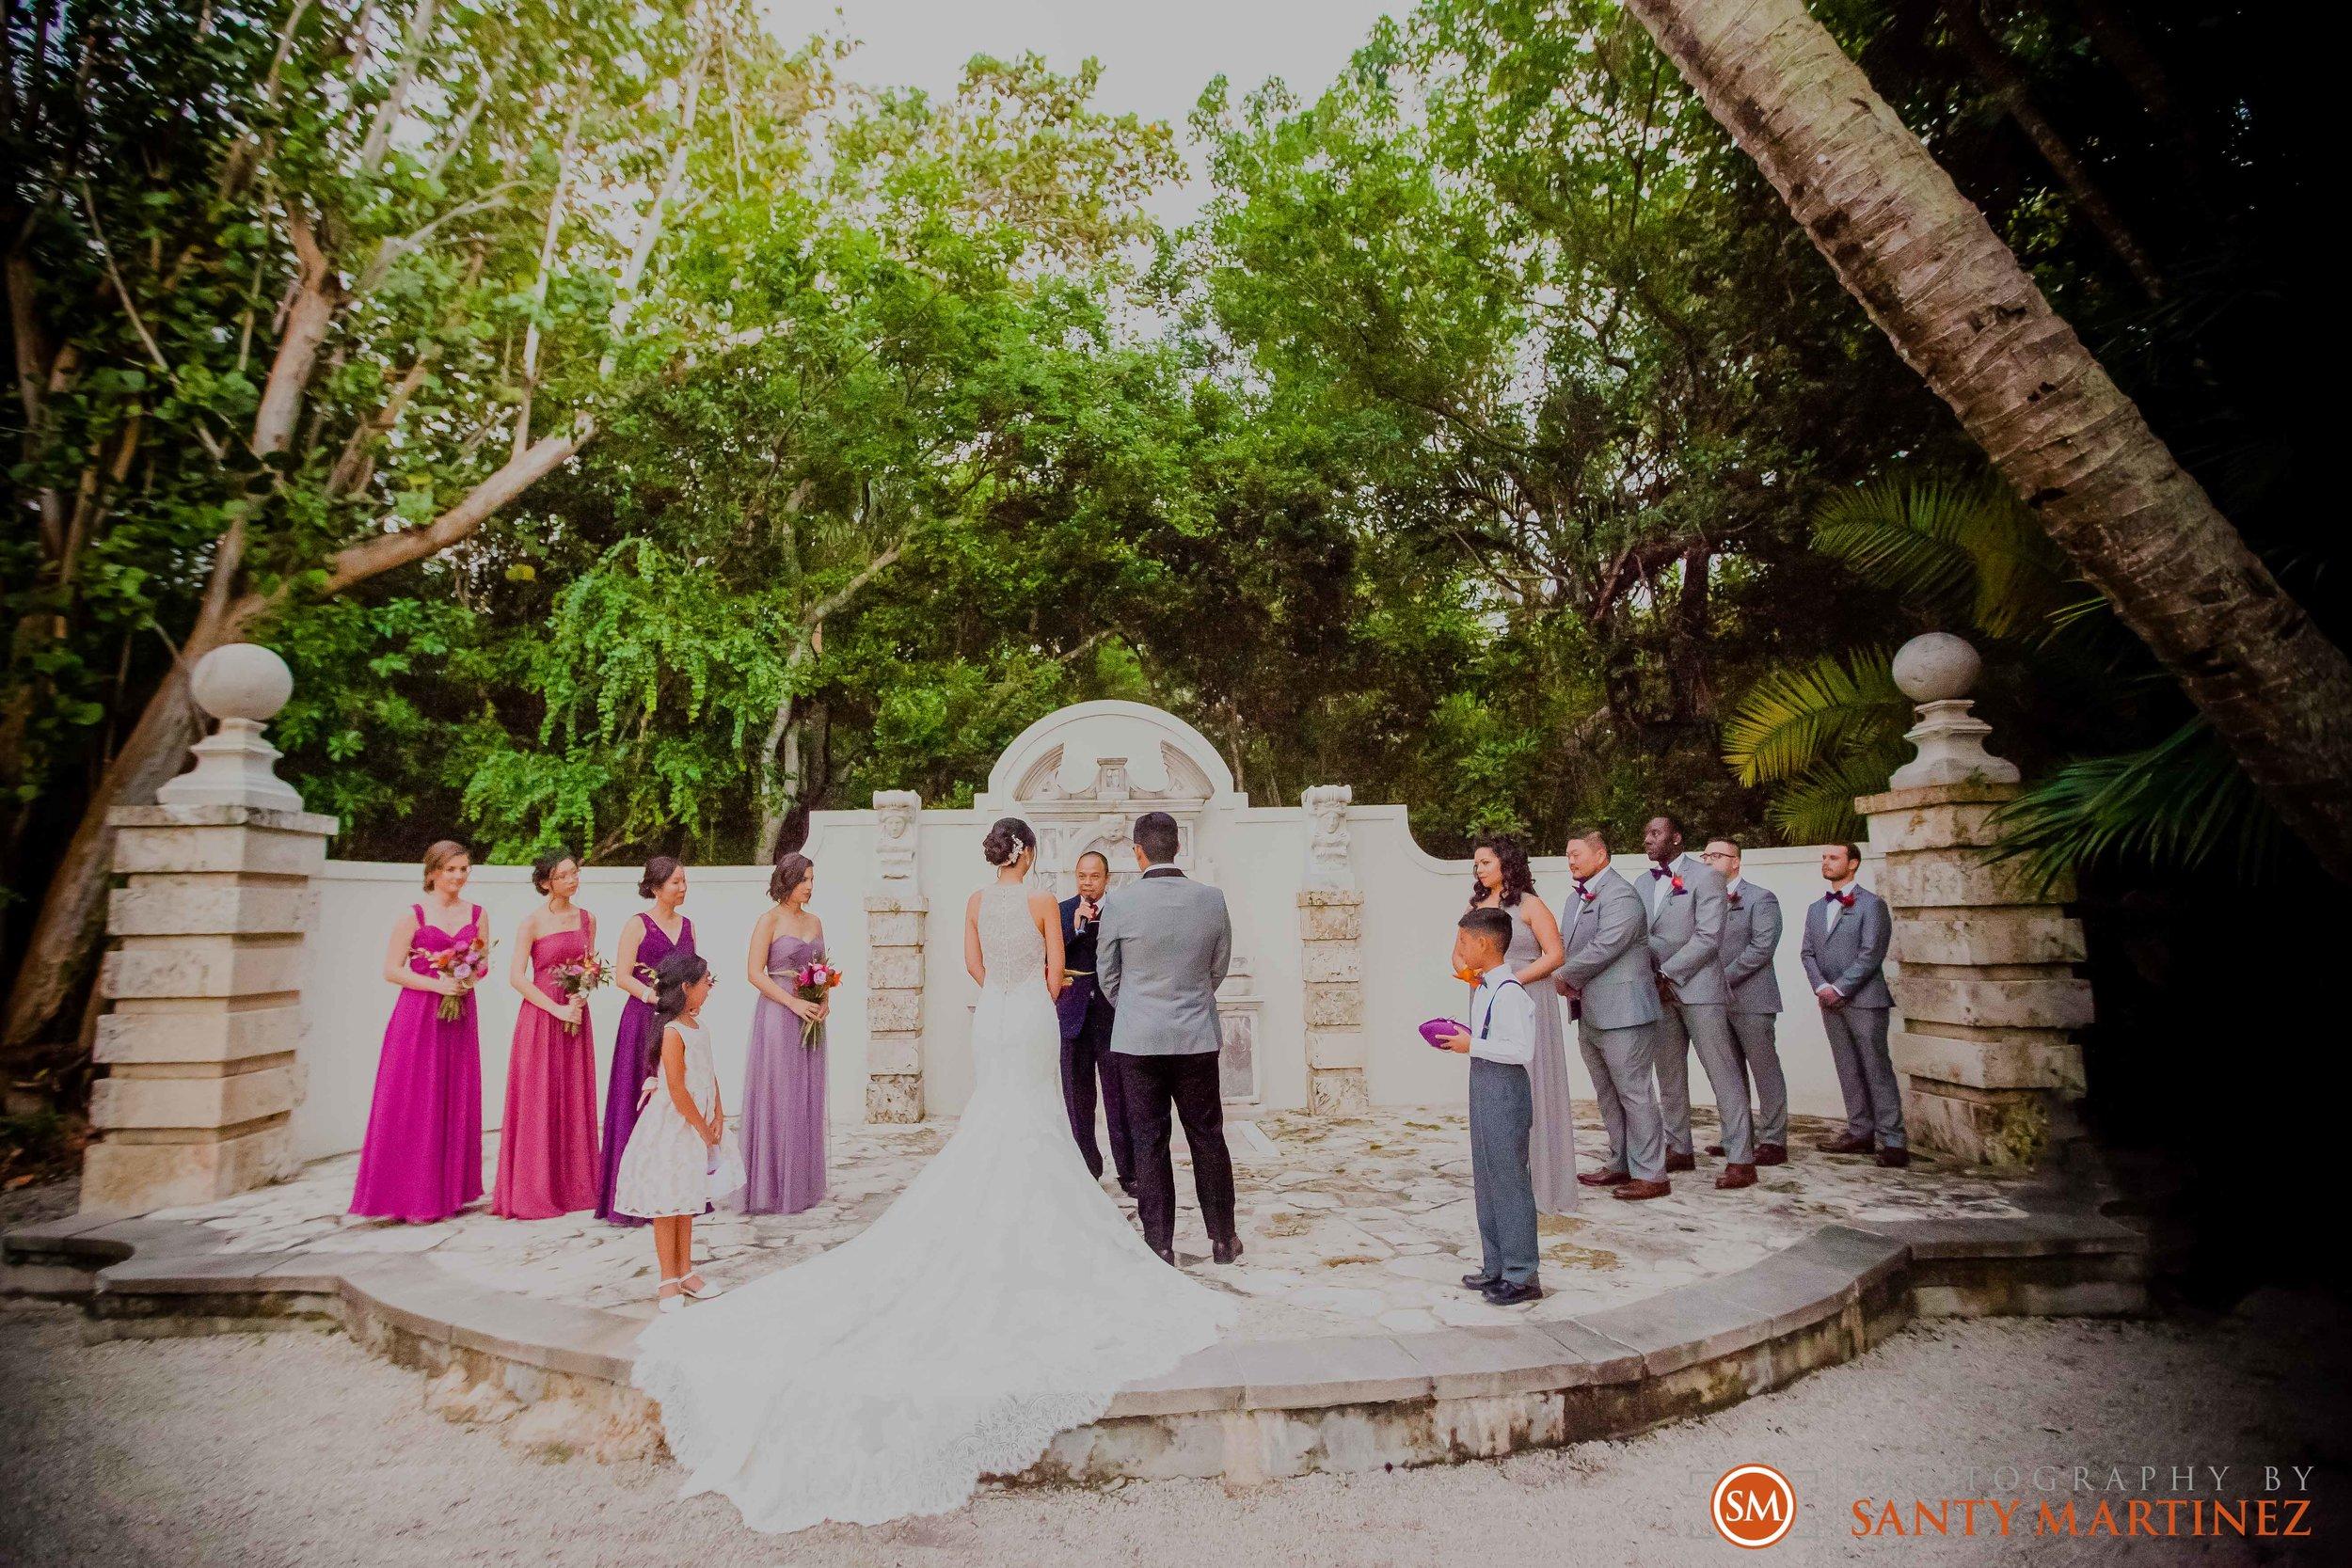 Wedding Bonnet House - Photography by Santy Martinez-27.jpg